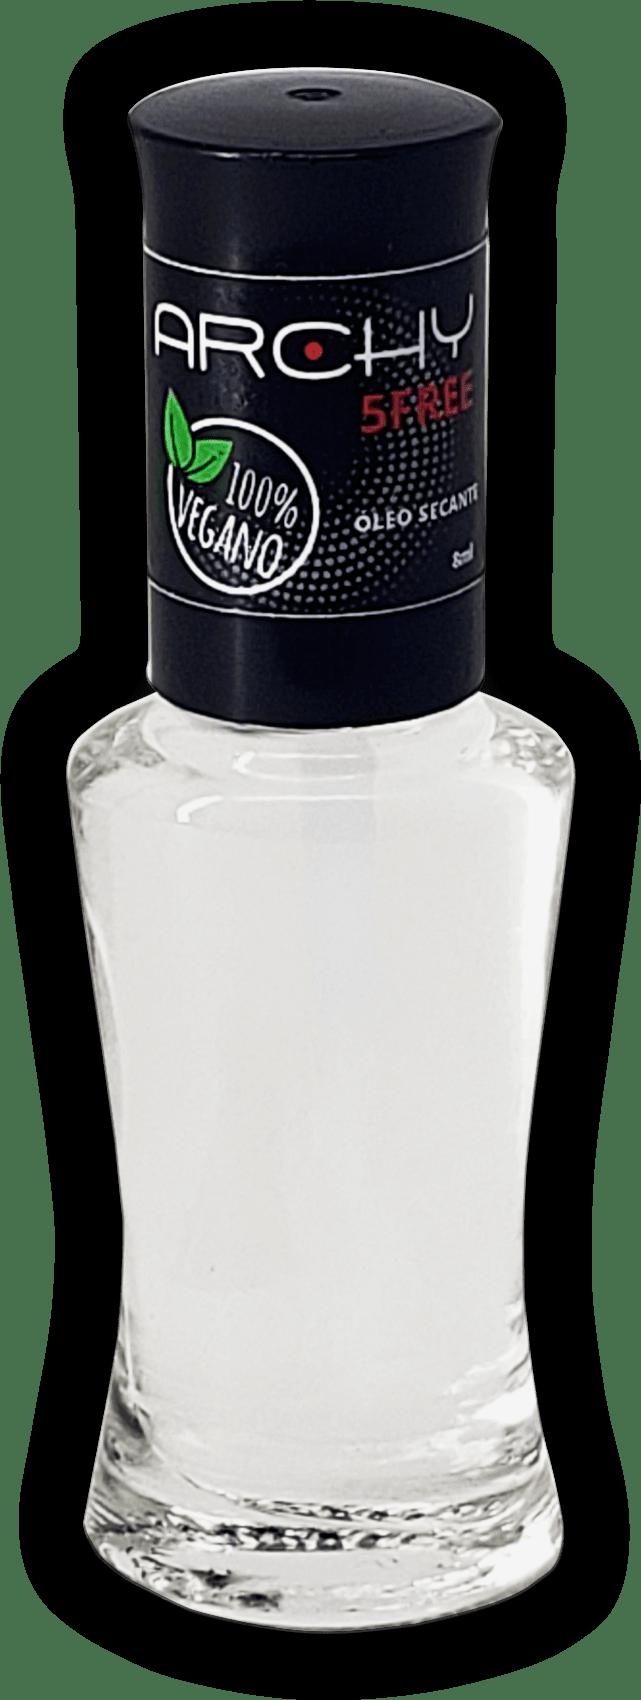 Esmalte Vegano 5 Free Óleo Secante - Archy Make Up